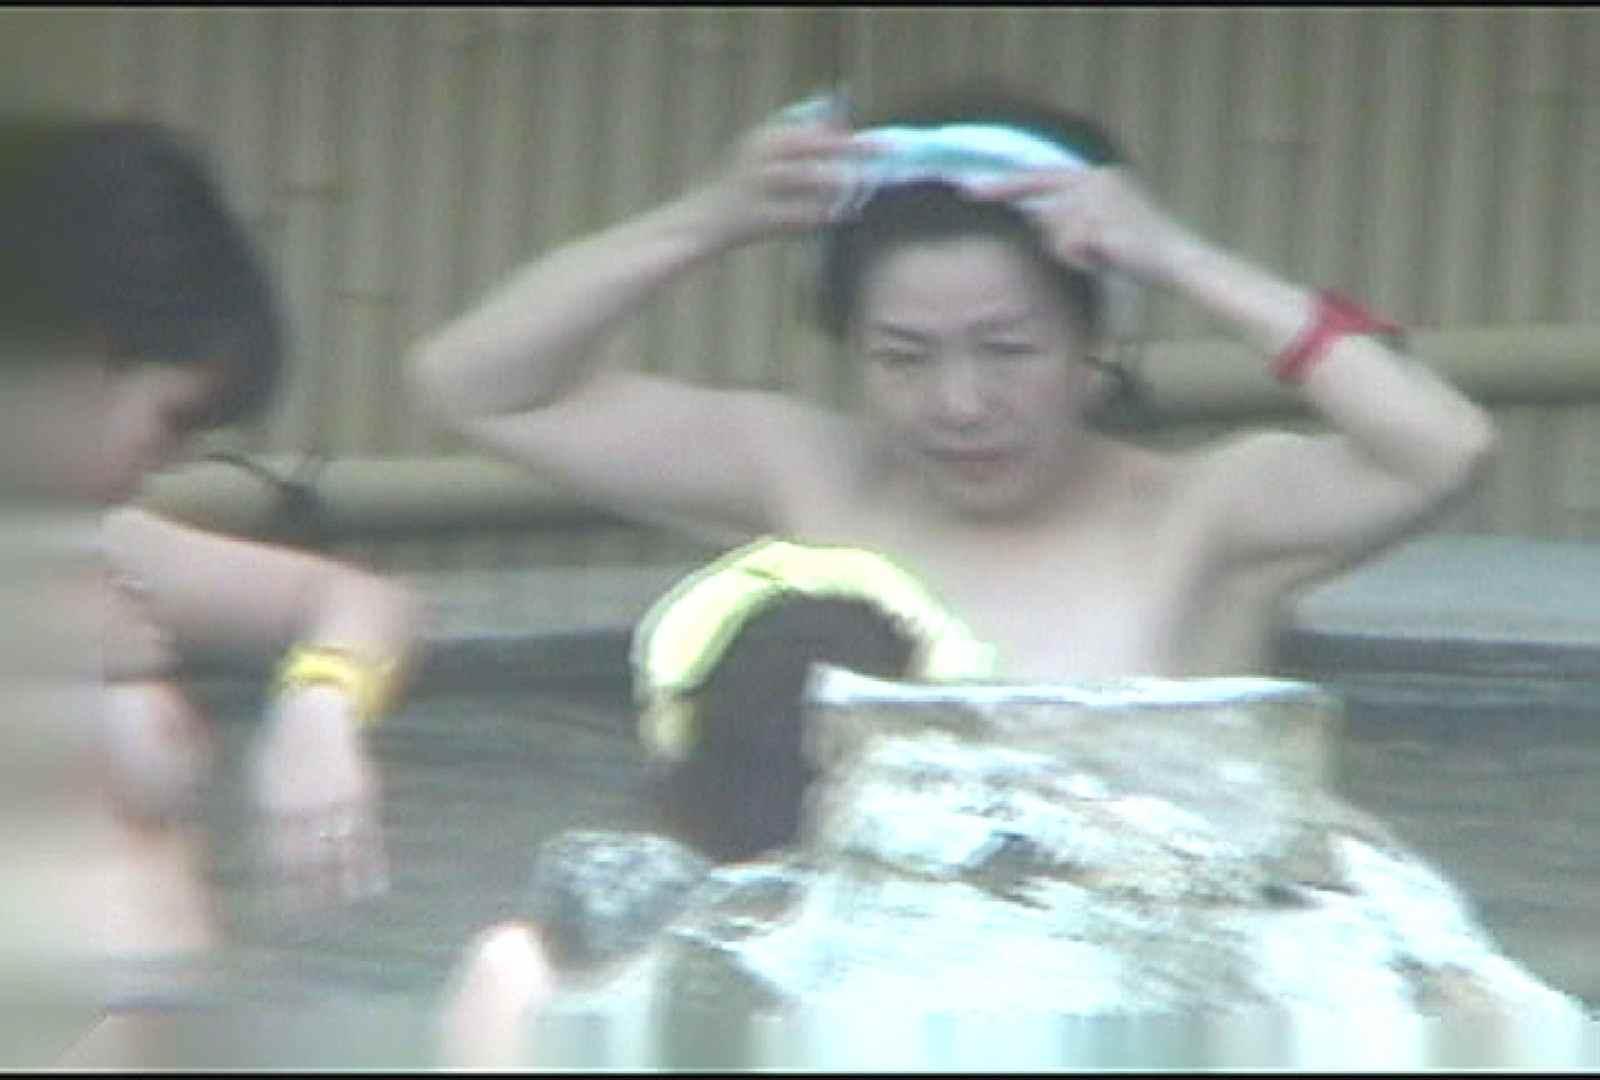 Aquaな露天風呂Vol.145 盗撮映像  78Pix 75